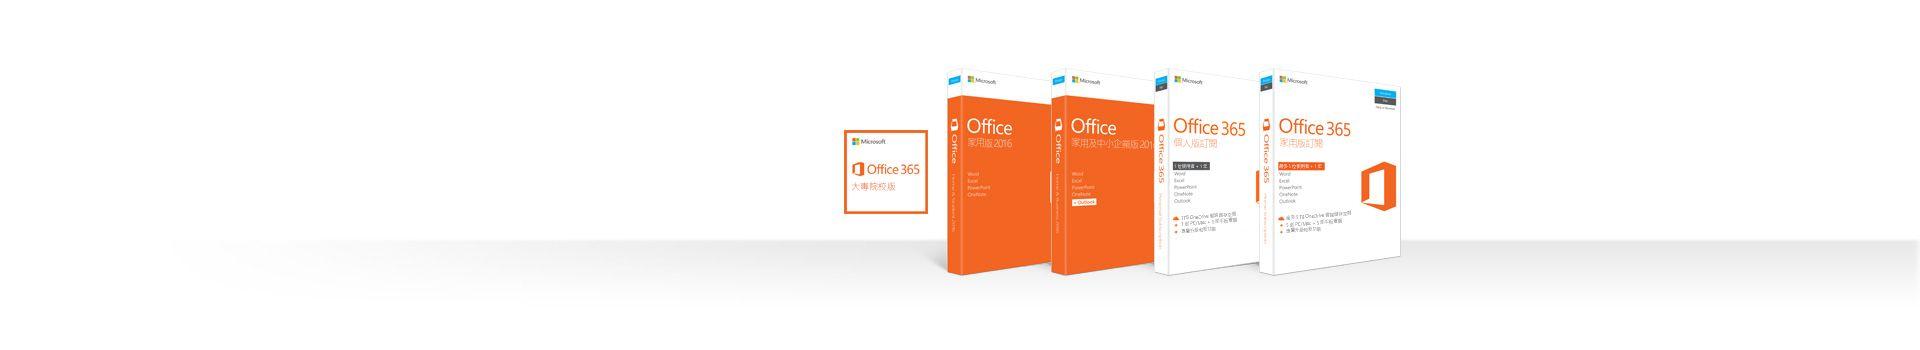 Mac 版 Office 2016 和 Mac 版 Office 365 產品的方格列